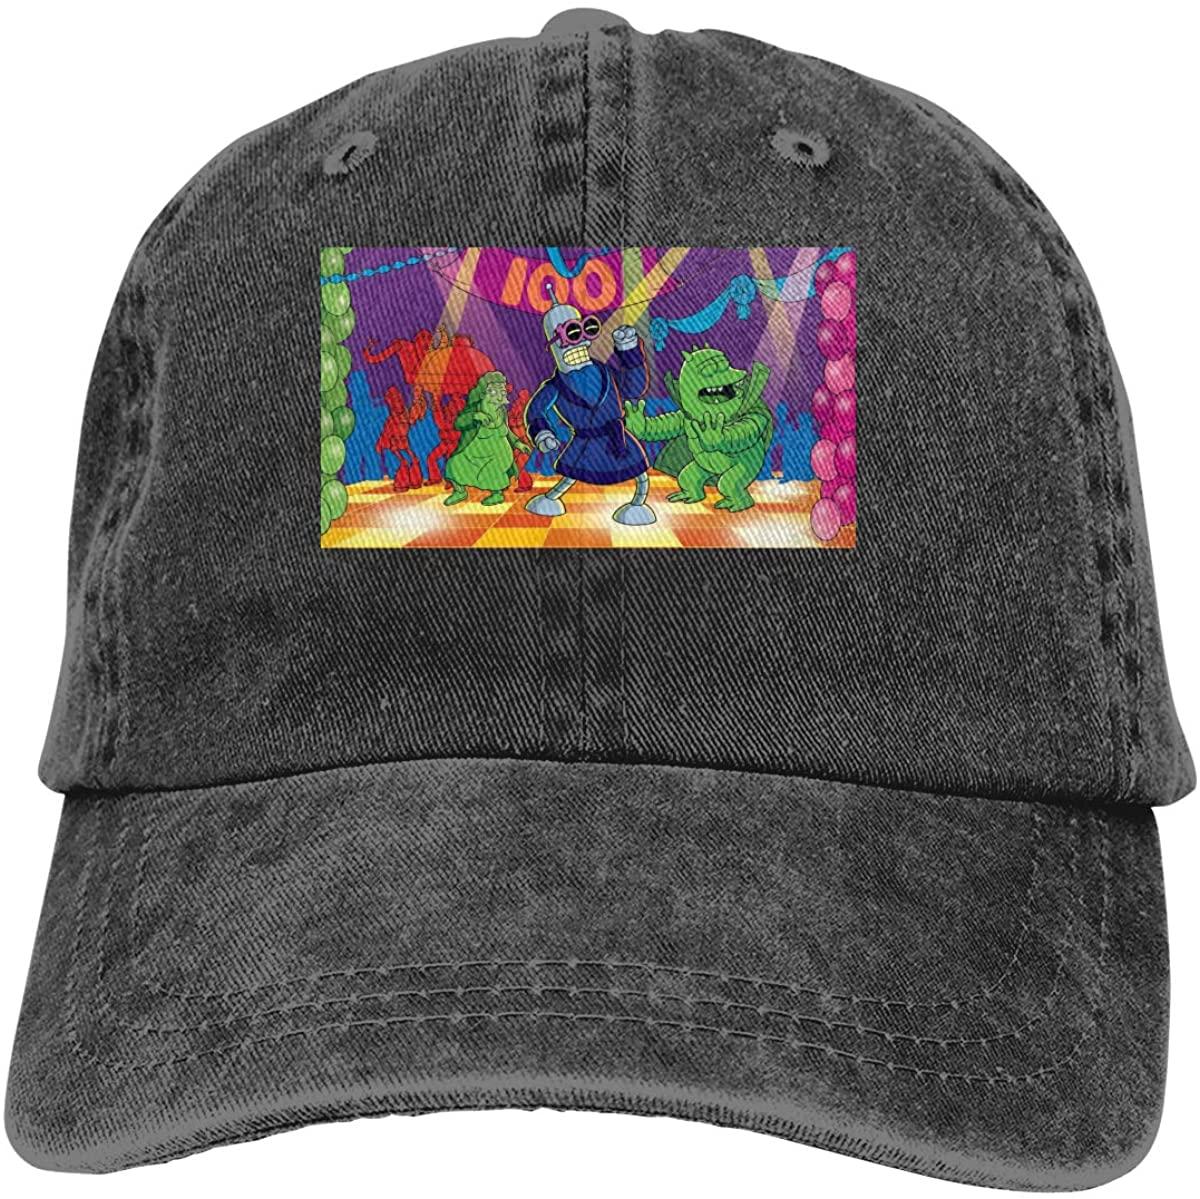 AP.Room Futurama Men's Women's Baseball Cap Adult Cowboy Hat Adjustable Athletic Hat